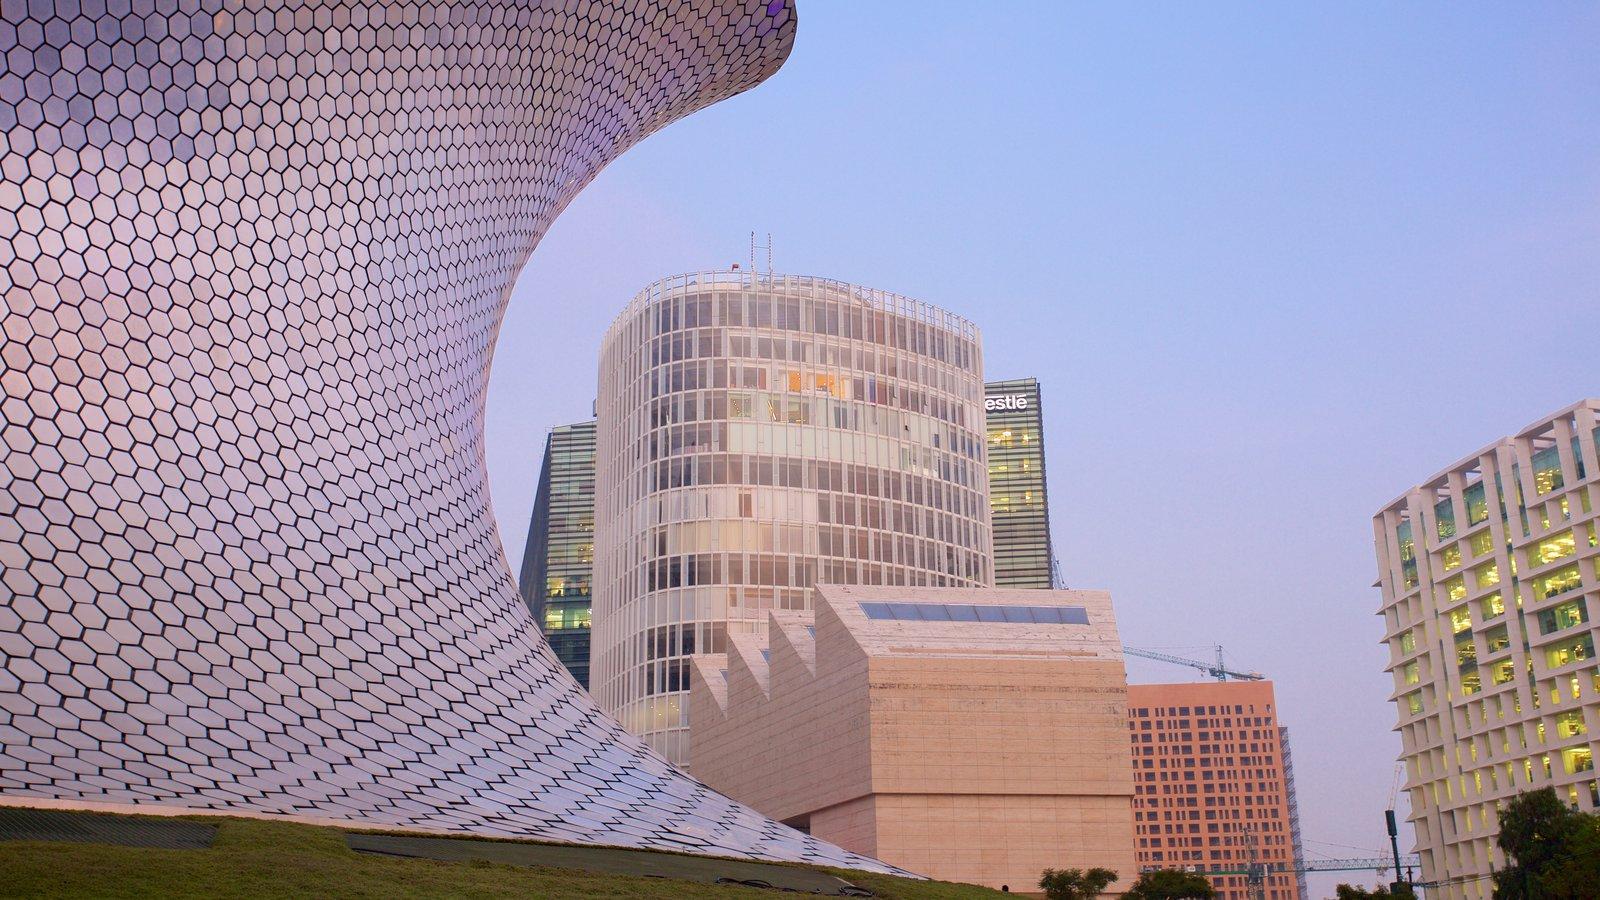 Museo Soumaya showing modern architecture and a city